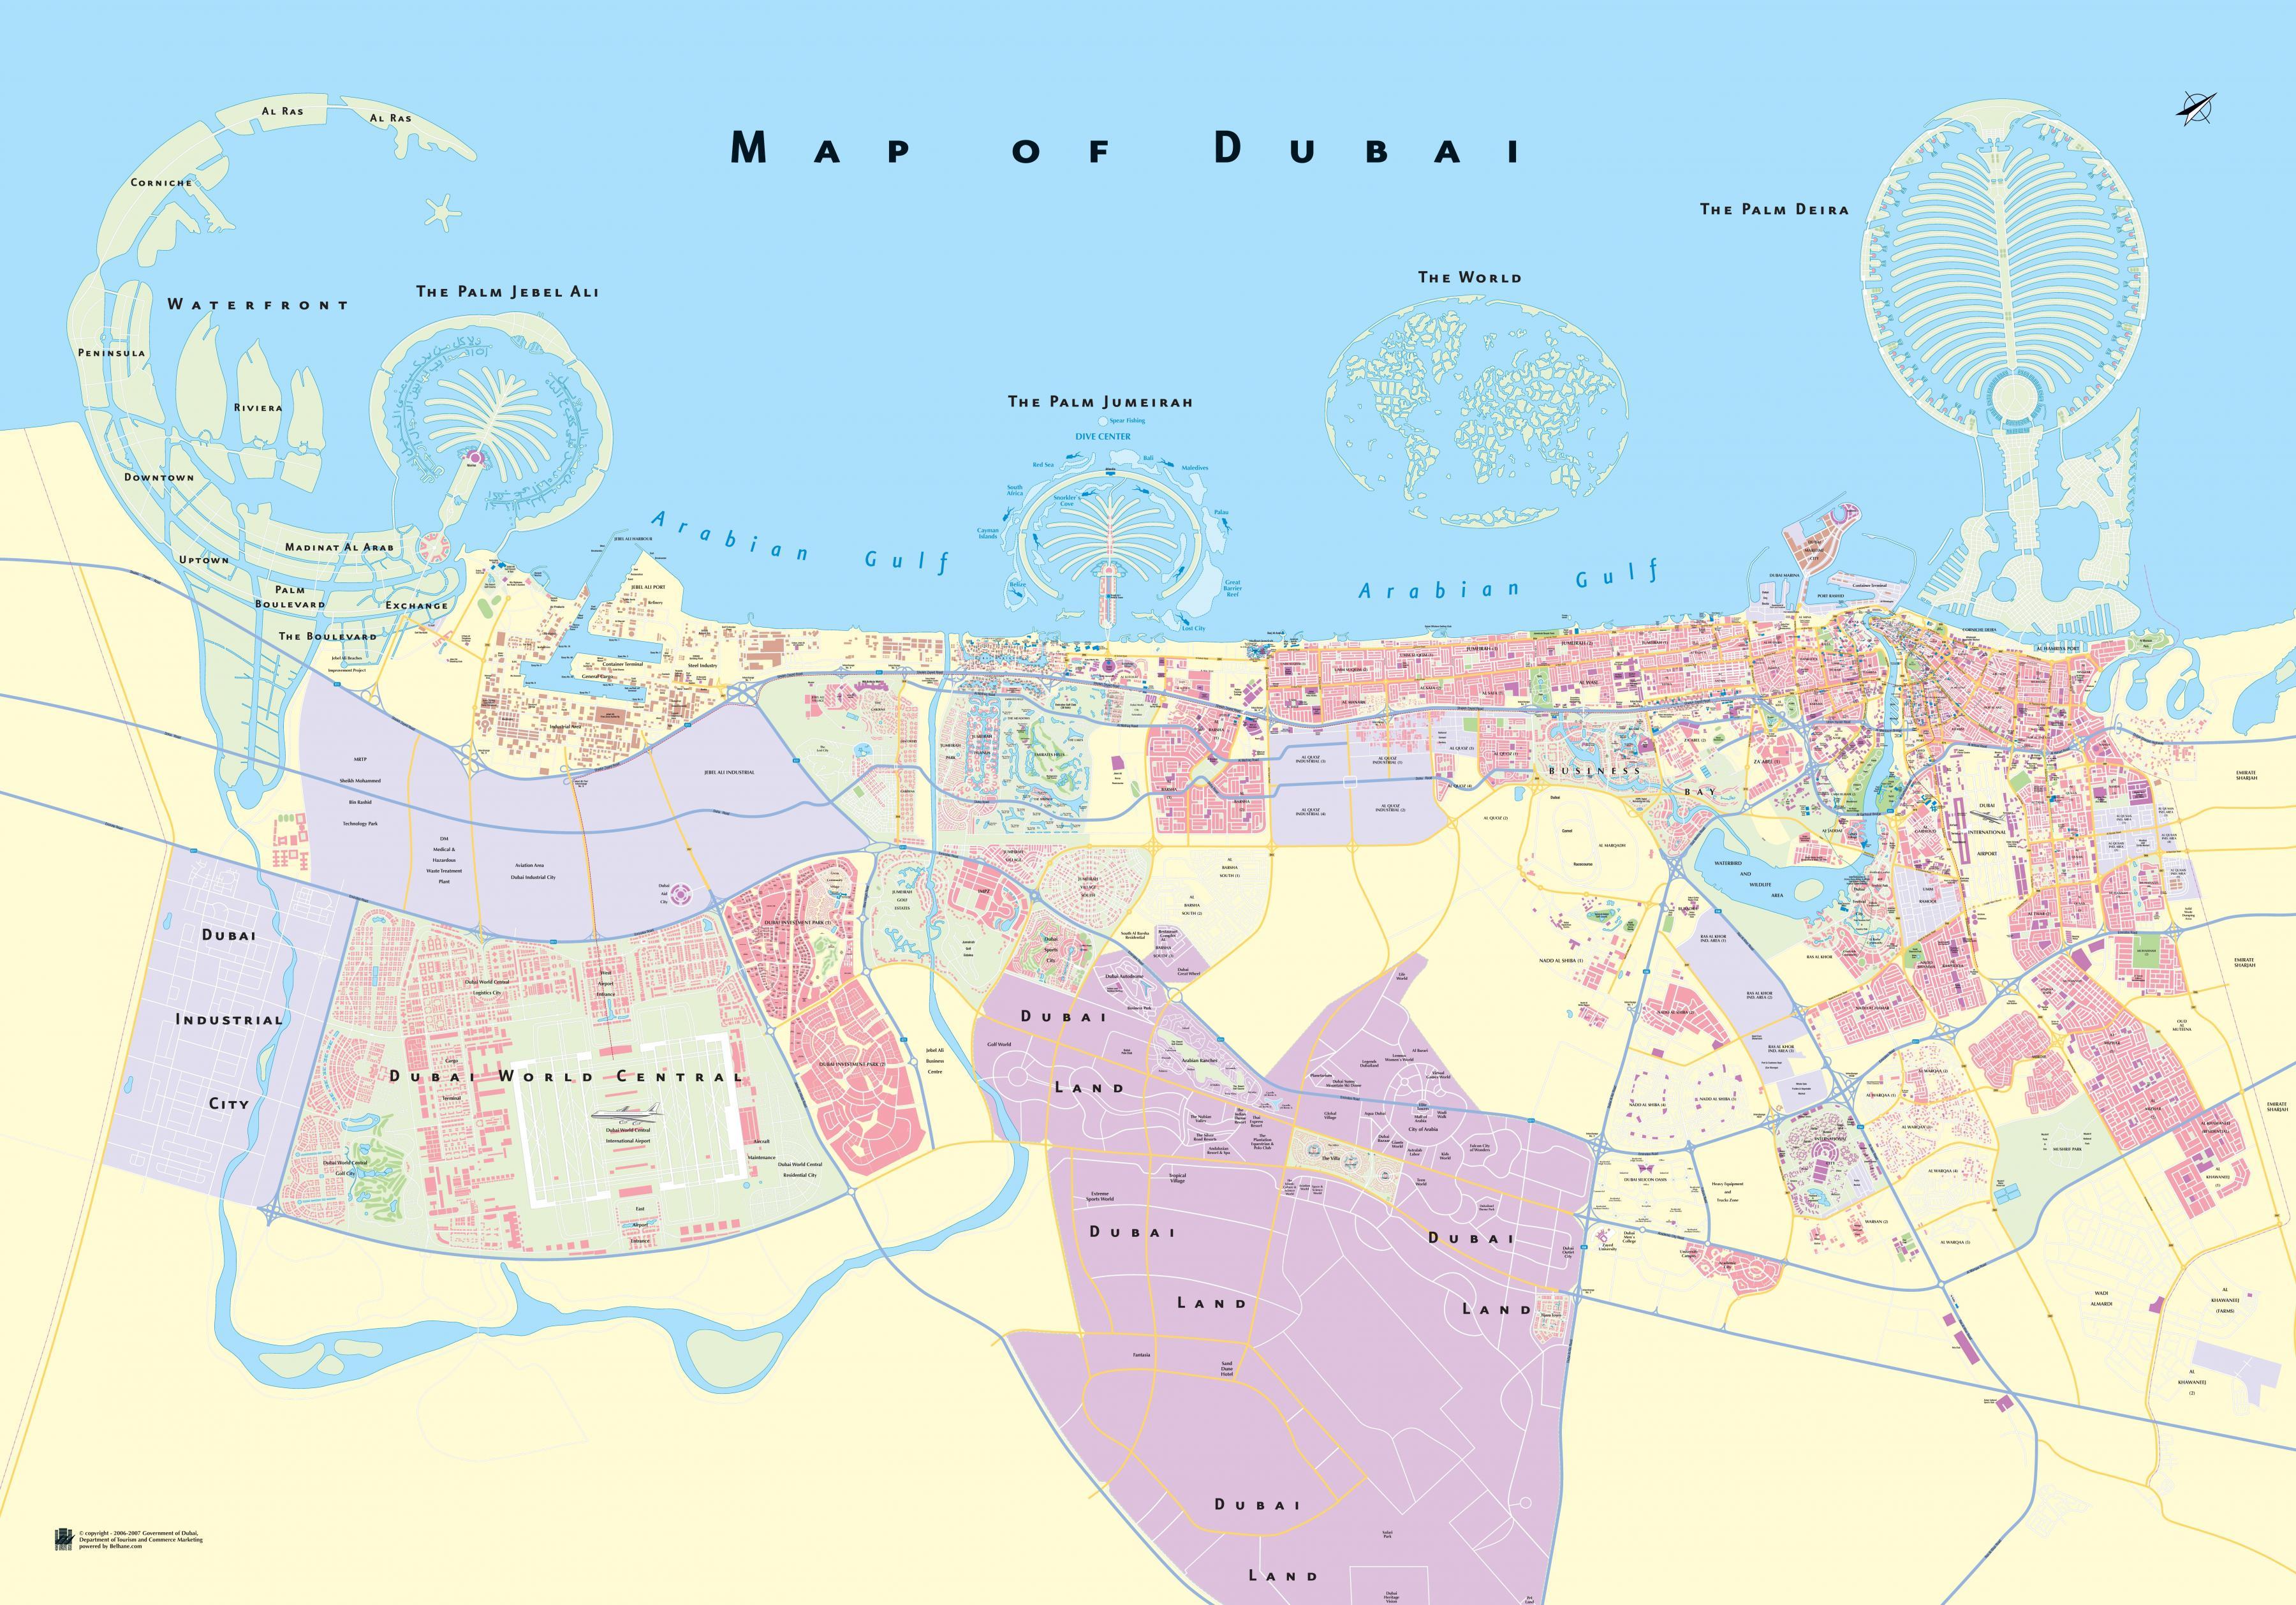 Dubai map - Location map Dubai (United Arab Emirates) on dubai aerial view, bur dubai map, dubai miracle garden map, dubai hotel on map, find dubai on world map, dubai neighborhoods map, dubai middle east map, dubai city, dubai country code, dubai airport location map, dubai uae on world map, dubai united arab emirates map, doh on map, dubai weather, hotel dubai location map,